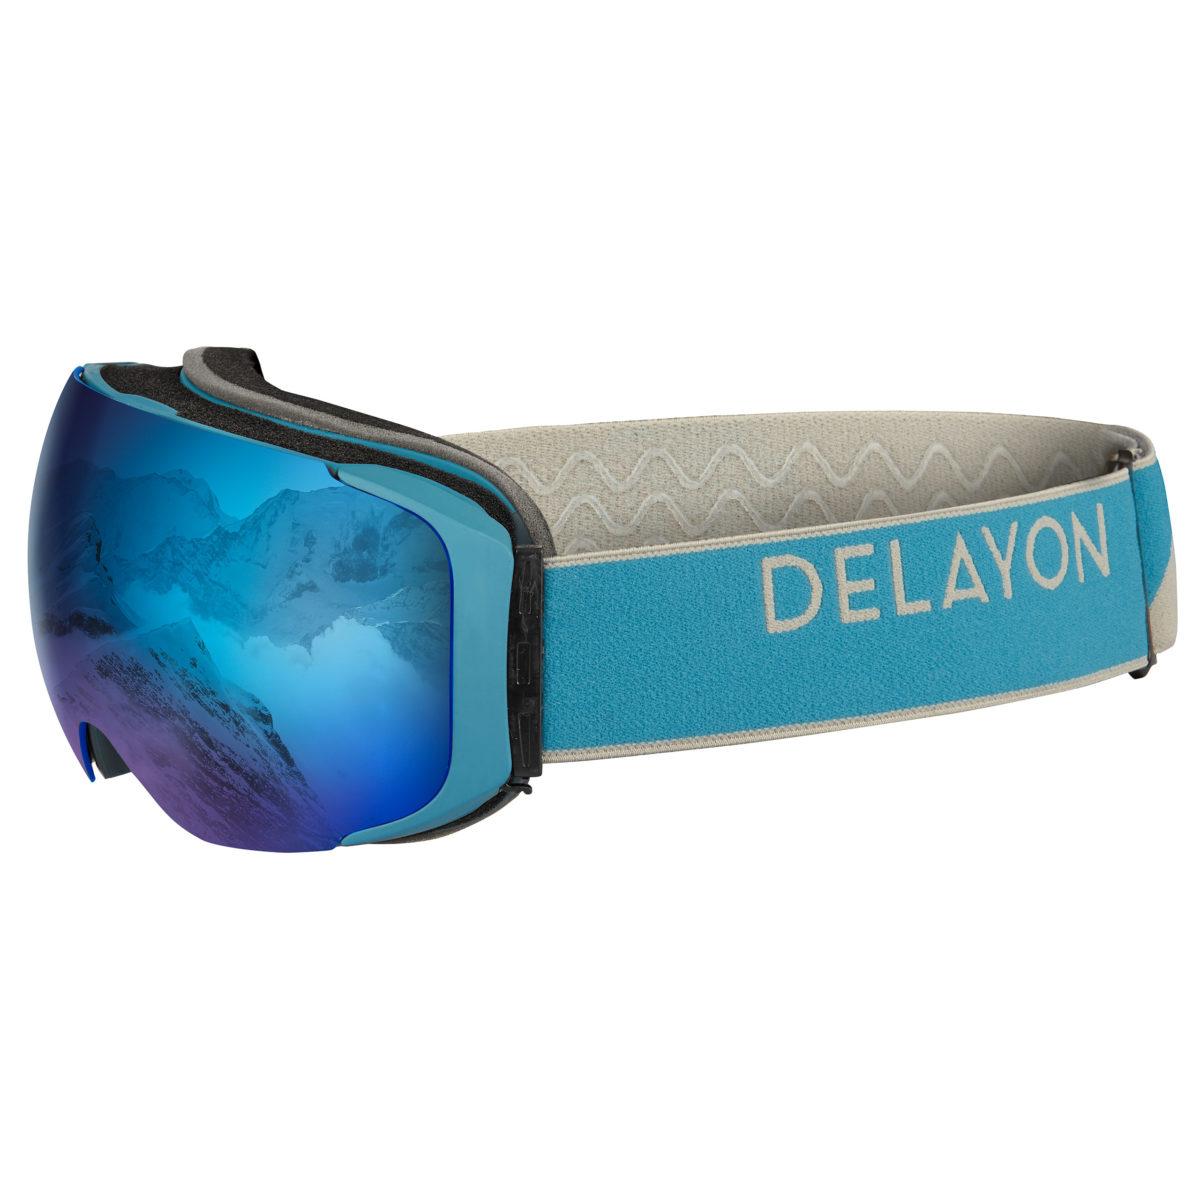 Delayon Eyewear Explorer Goggle Navy Gray Space Blue